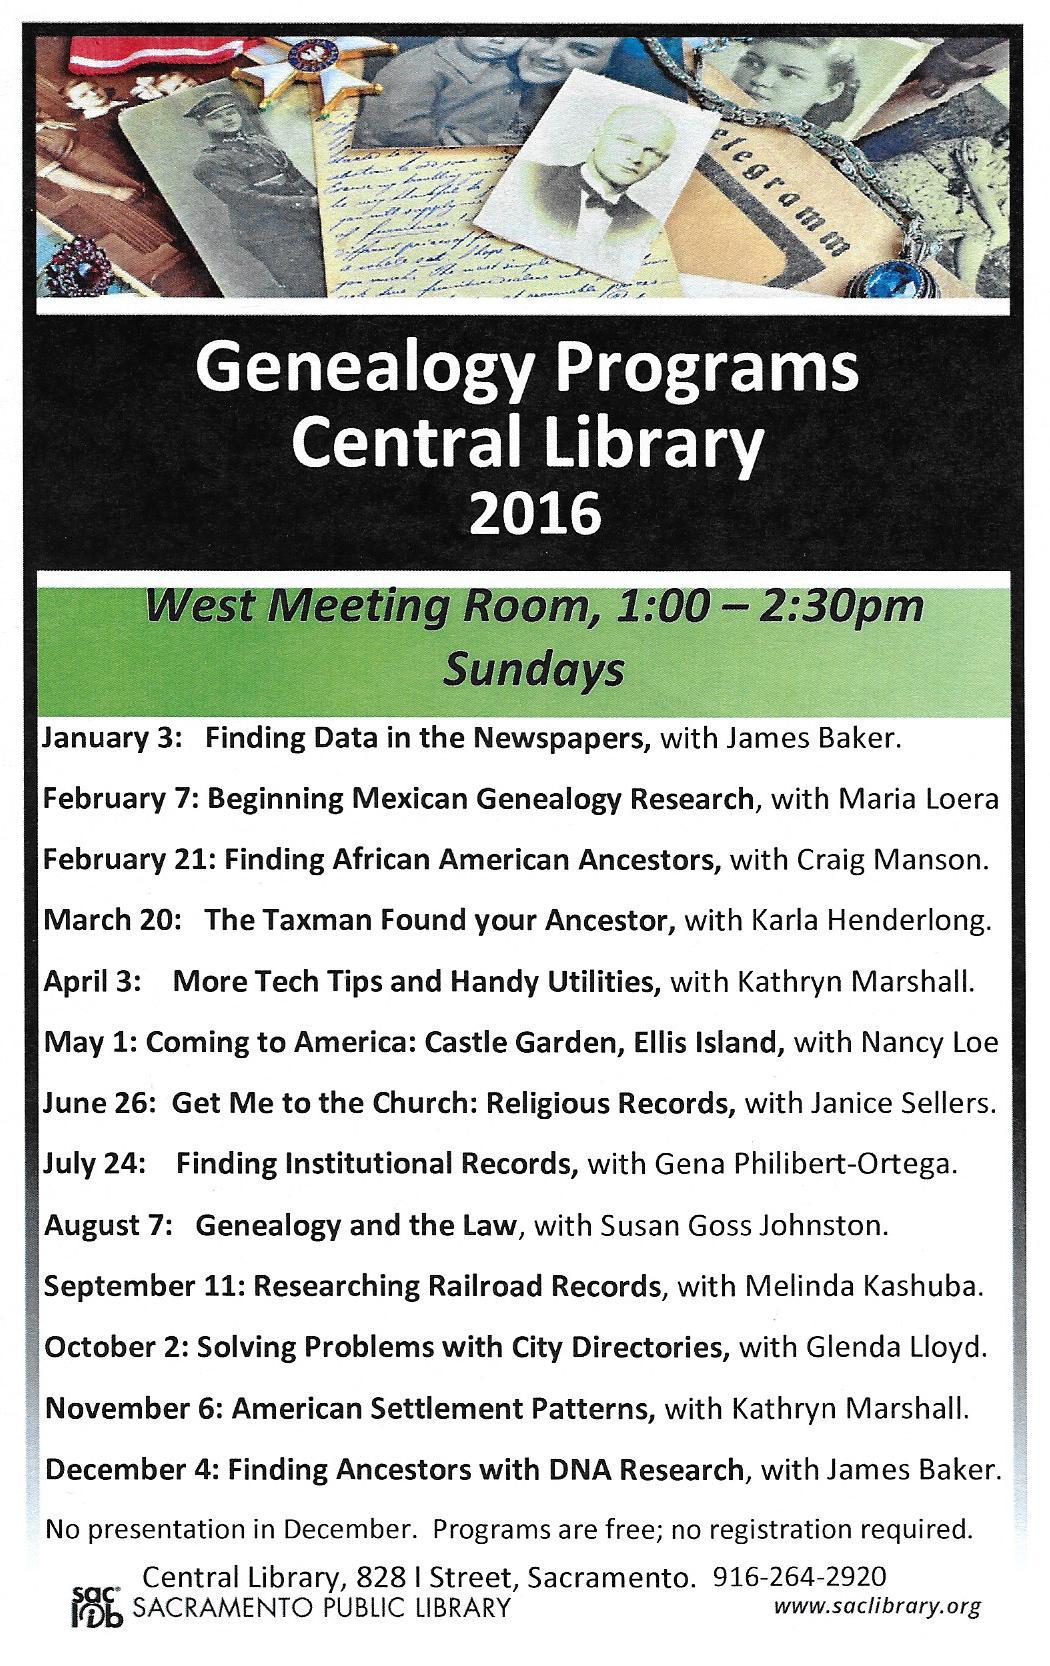 Boston university genealogical research certificate genealogy lady sacramento library 1betcityfo Choice Image